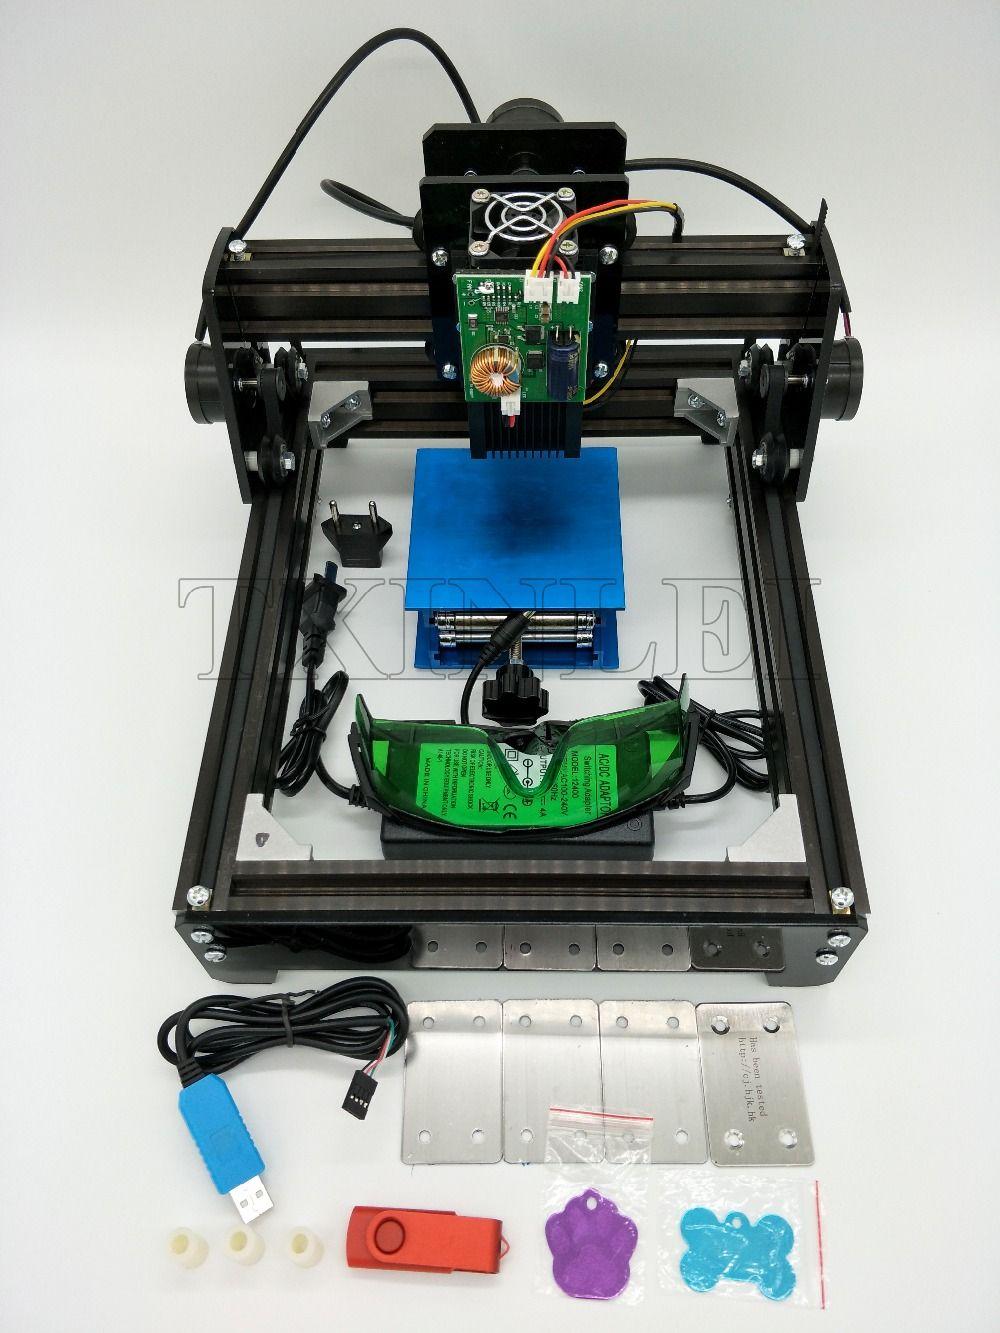 DIY USB Mini Laser Engraving Machine Engraver Cutting Marking Printer For Wood Leather Metal Stainless Steel Ceramics 10W 15W